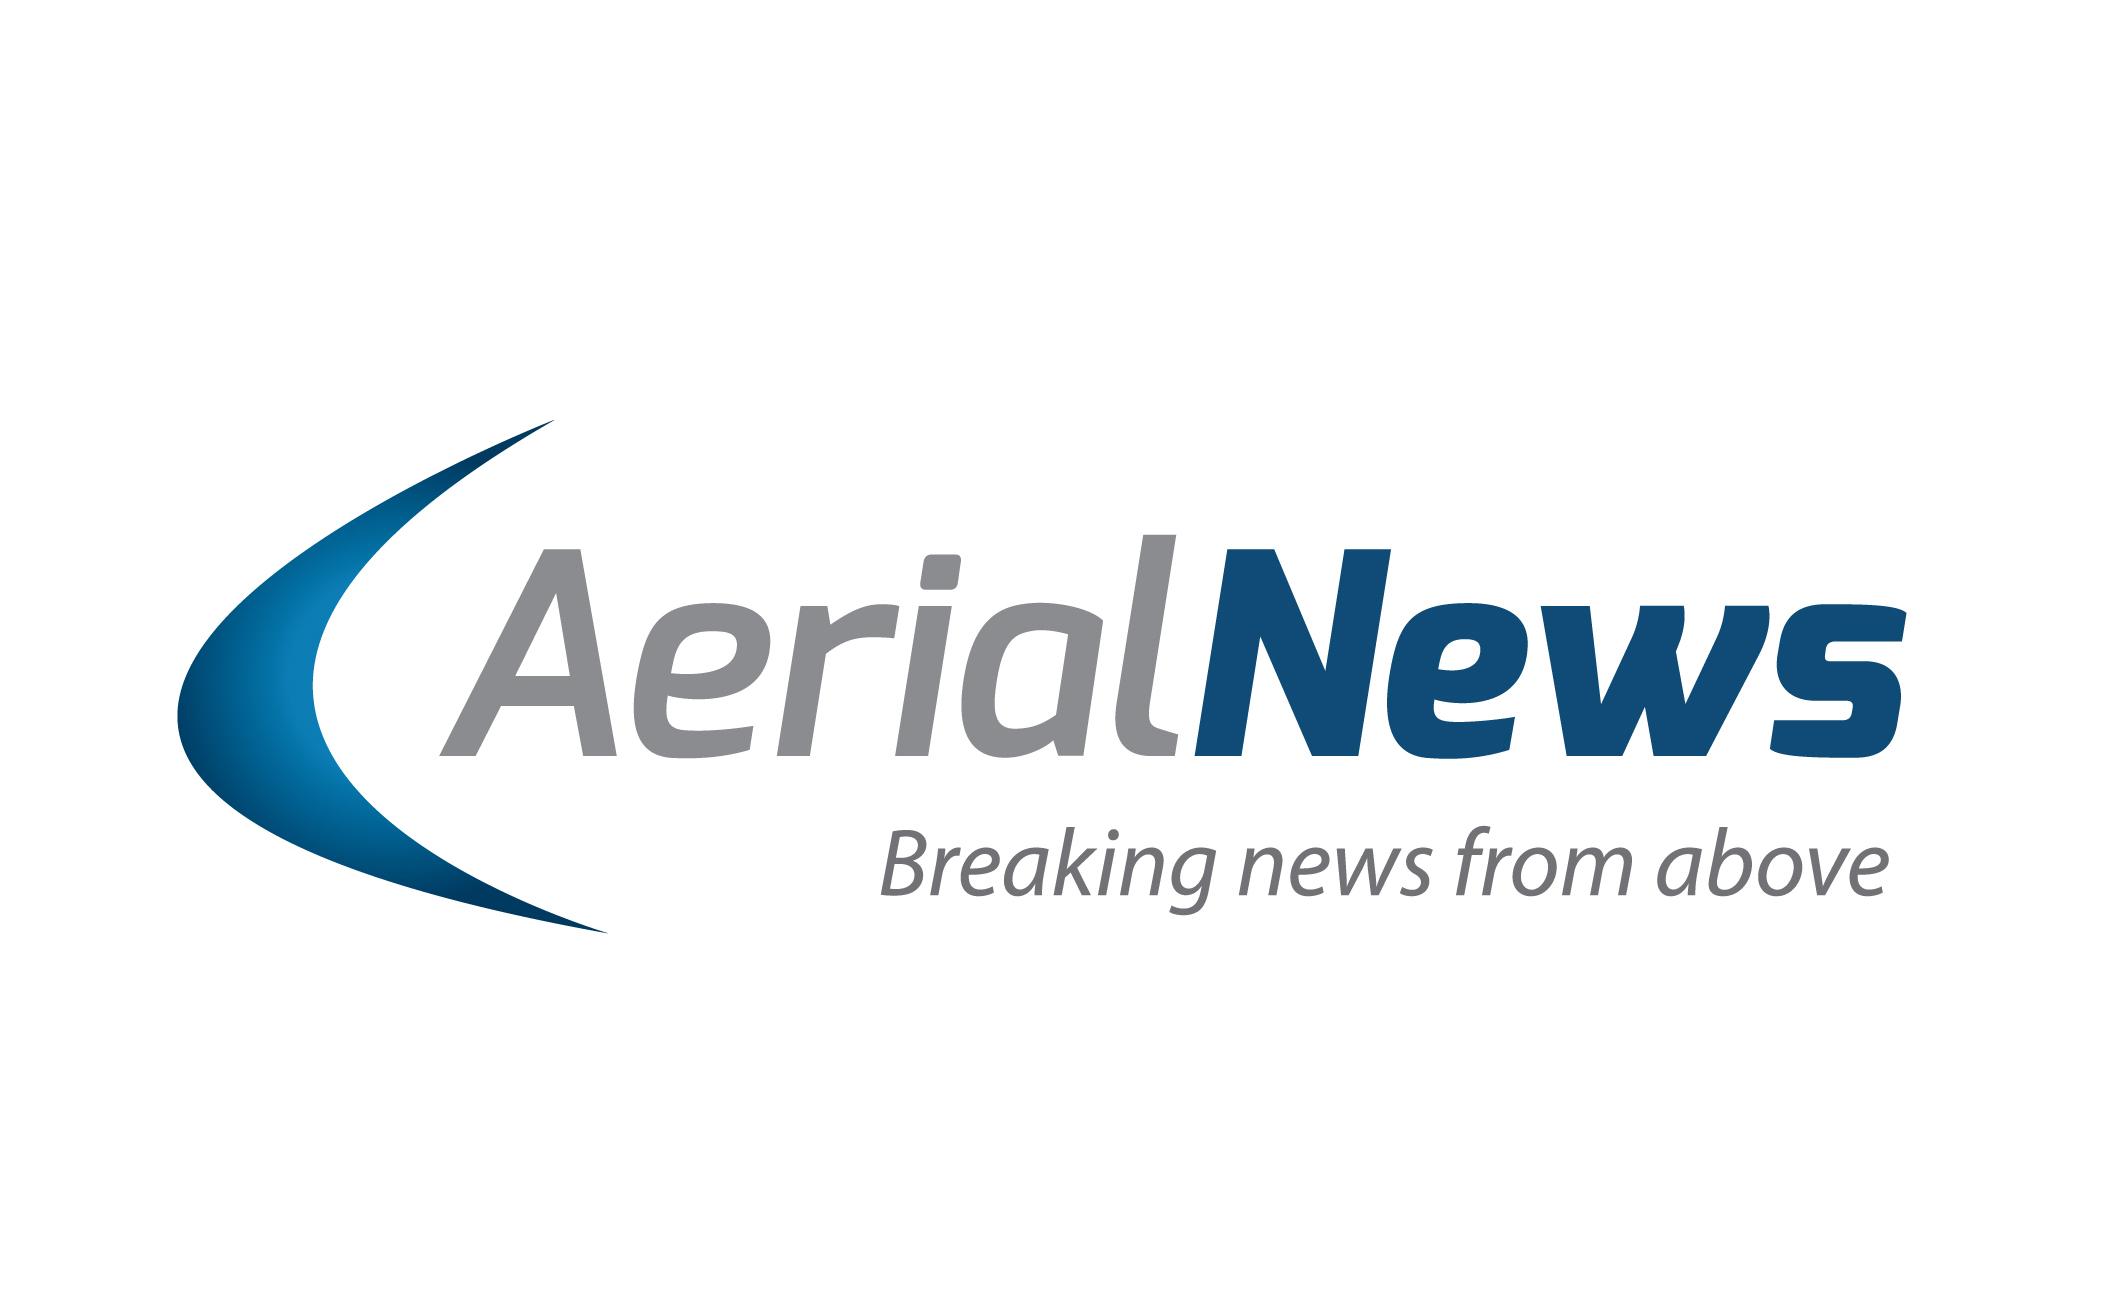 Aerial News